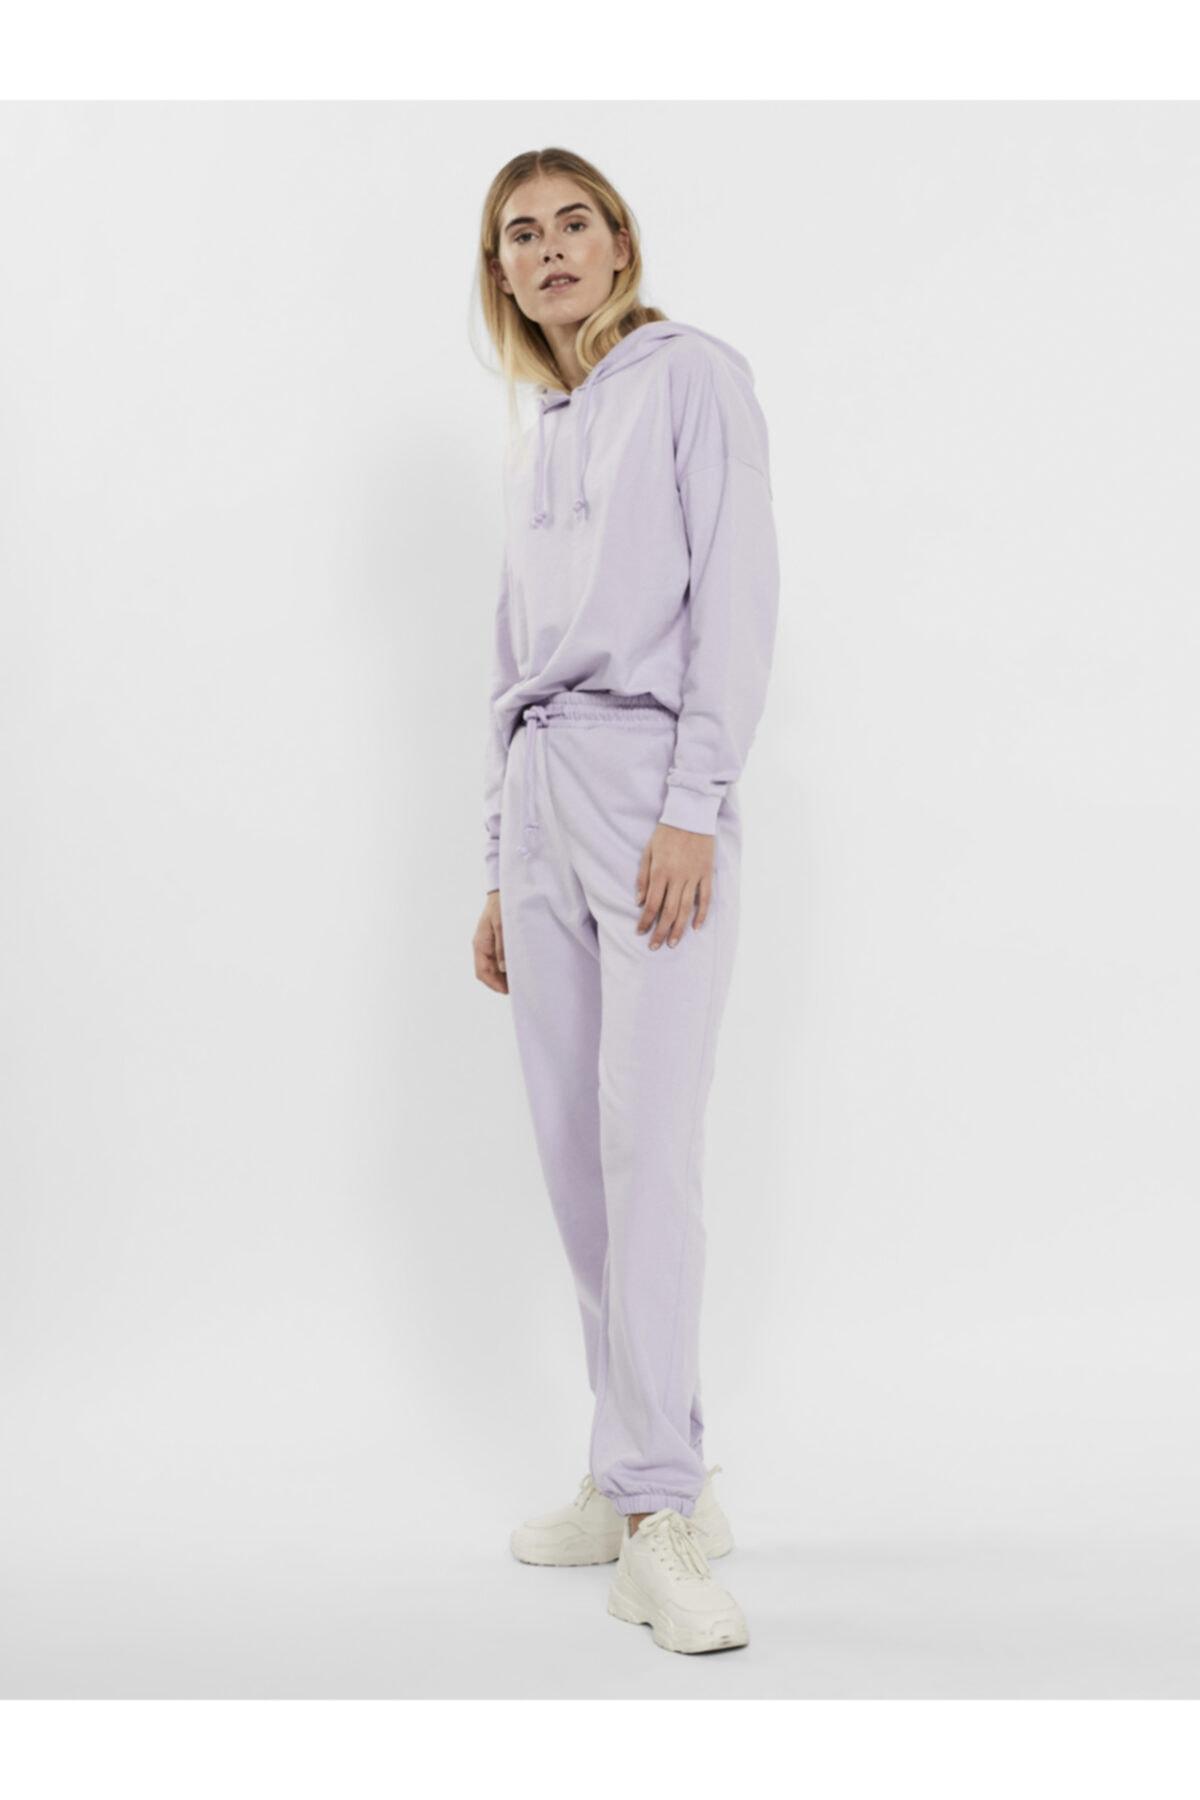 Vero Moda Kadın Pastel Lilac Paçası Lastikli Yüksek Bel Jogger Pantolon 10251096 Vmoctavıa 1